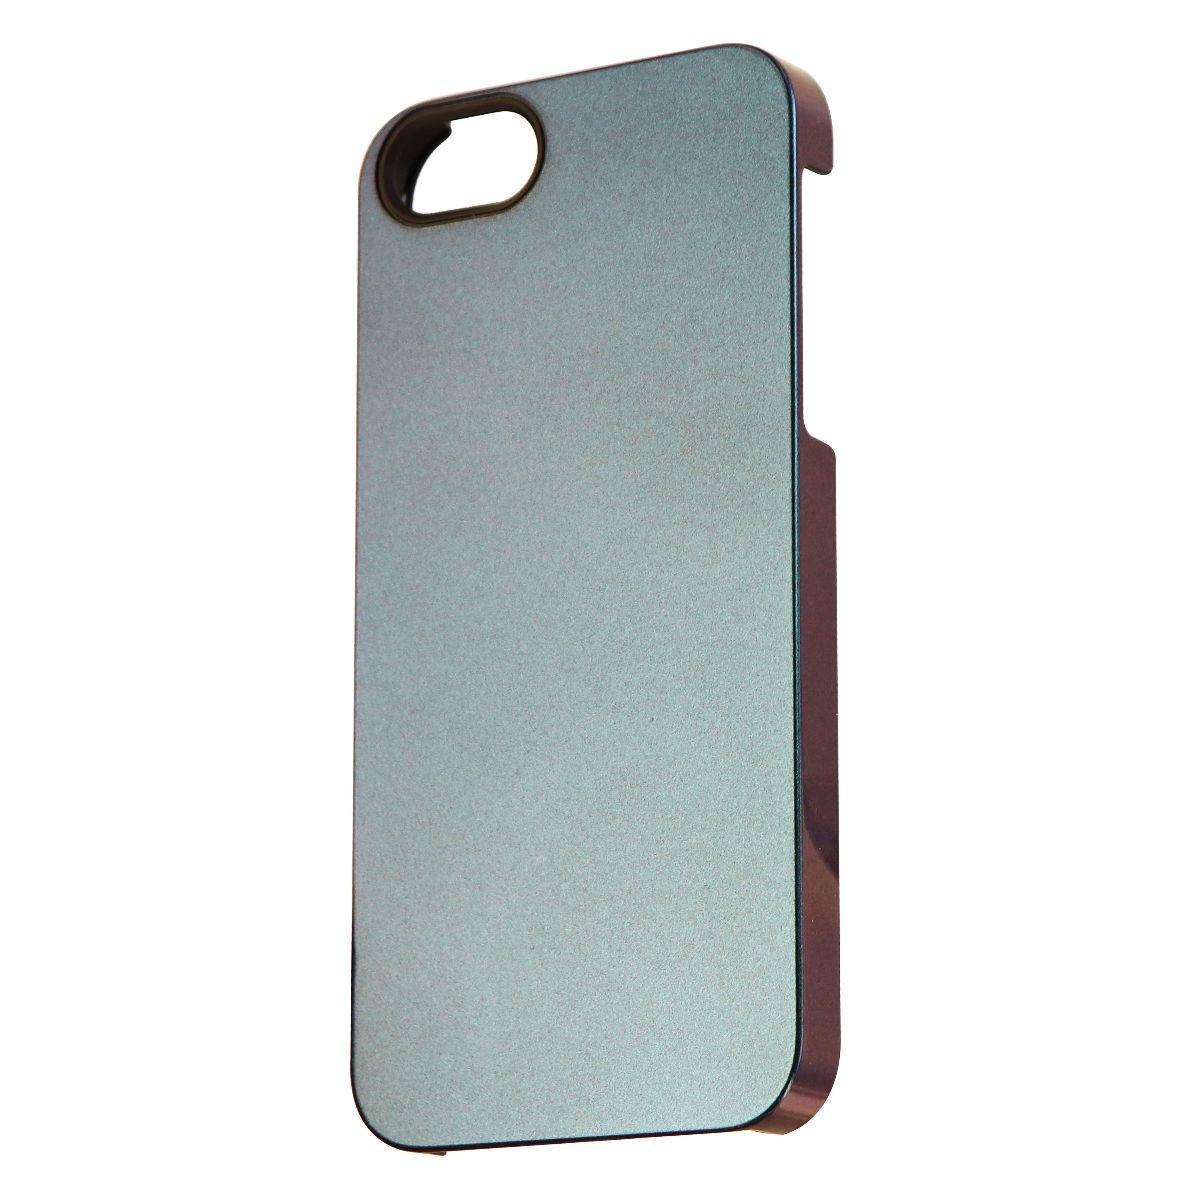 Belkin Shield Color Shift Case for Apple iPhone SE / 5s / 5 - Dark Green